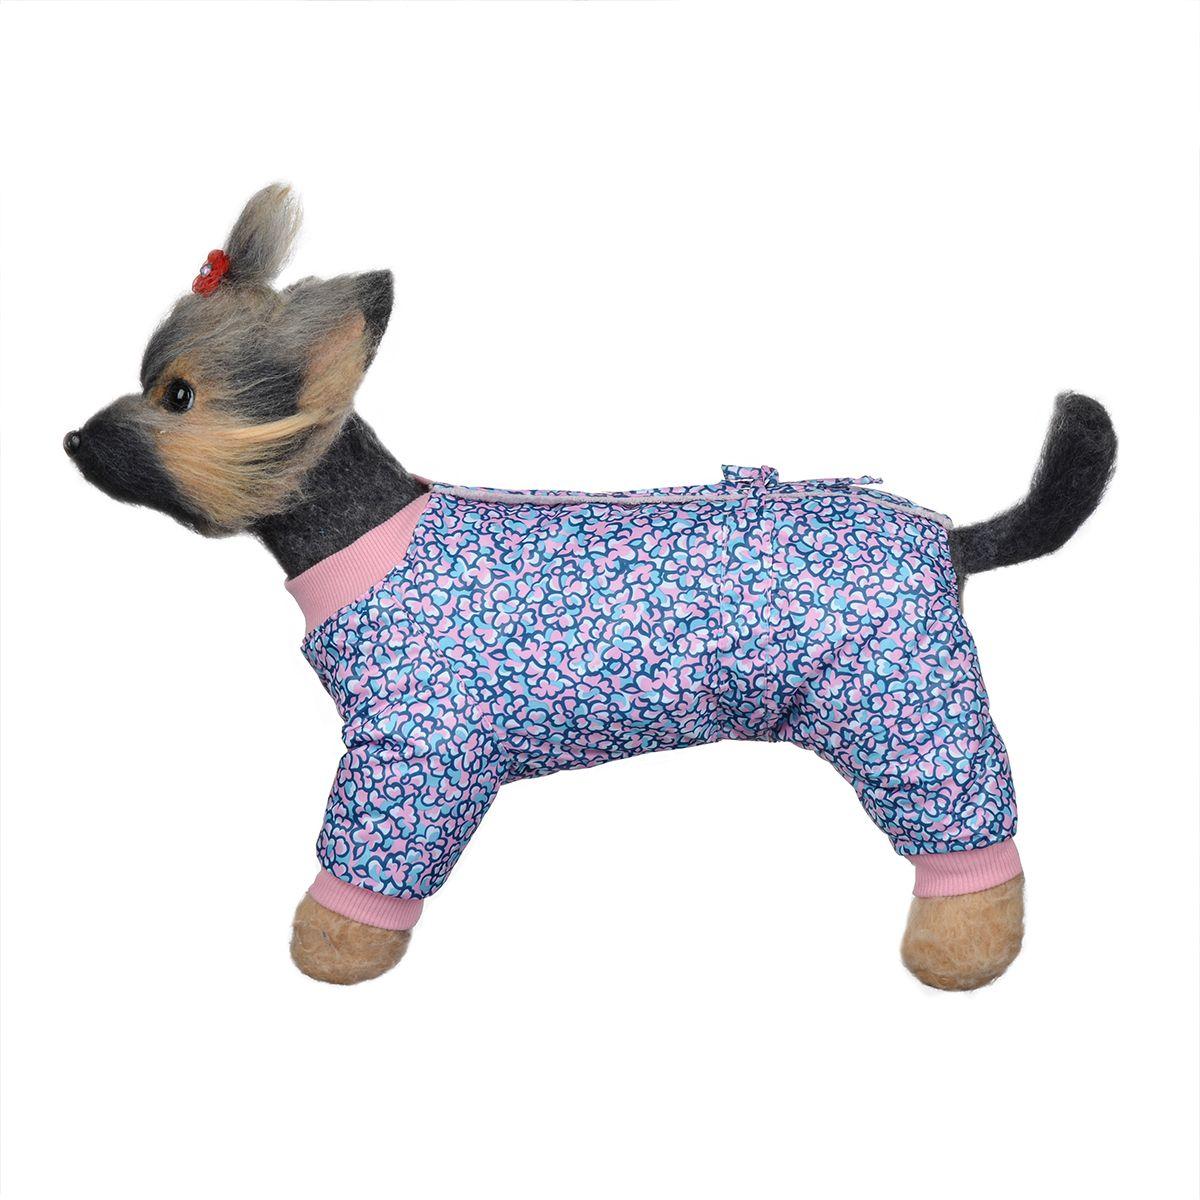 Комбинезон для собак Dogmoda  Лаки , зимний, для девочки, цвет: розовый, синий. Размер 4 (XL)